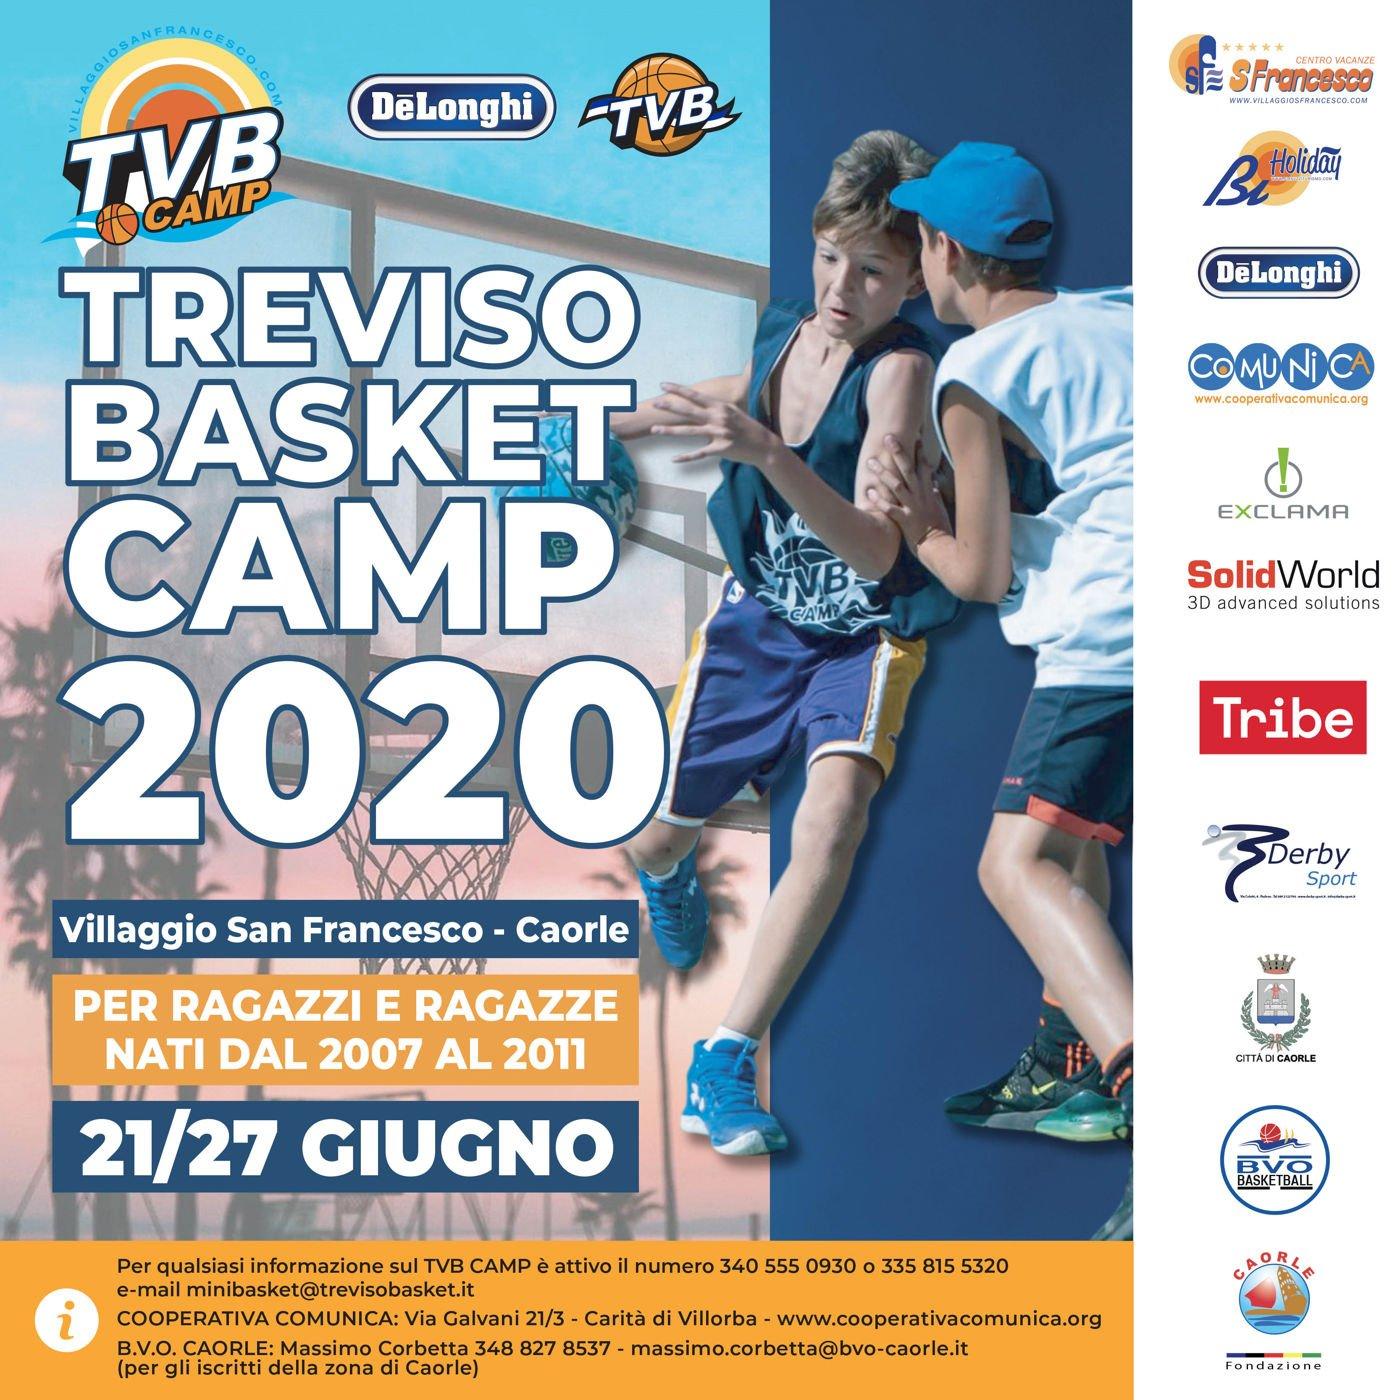 TVB Camp 2020